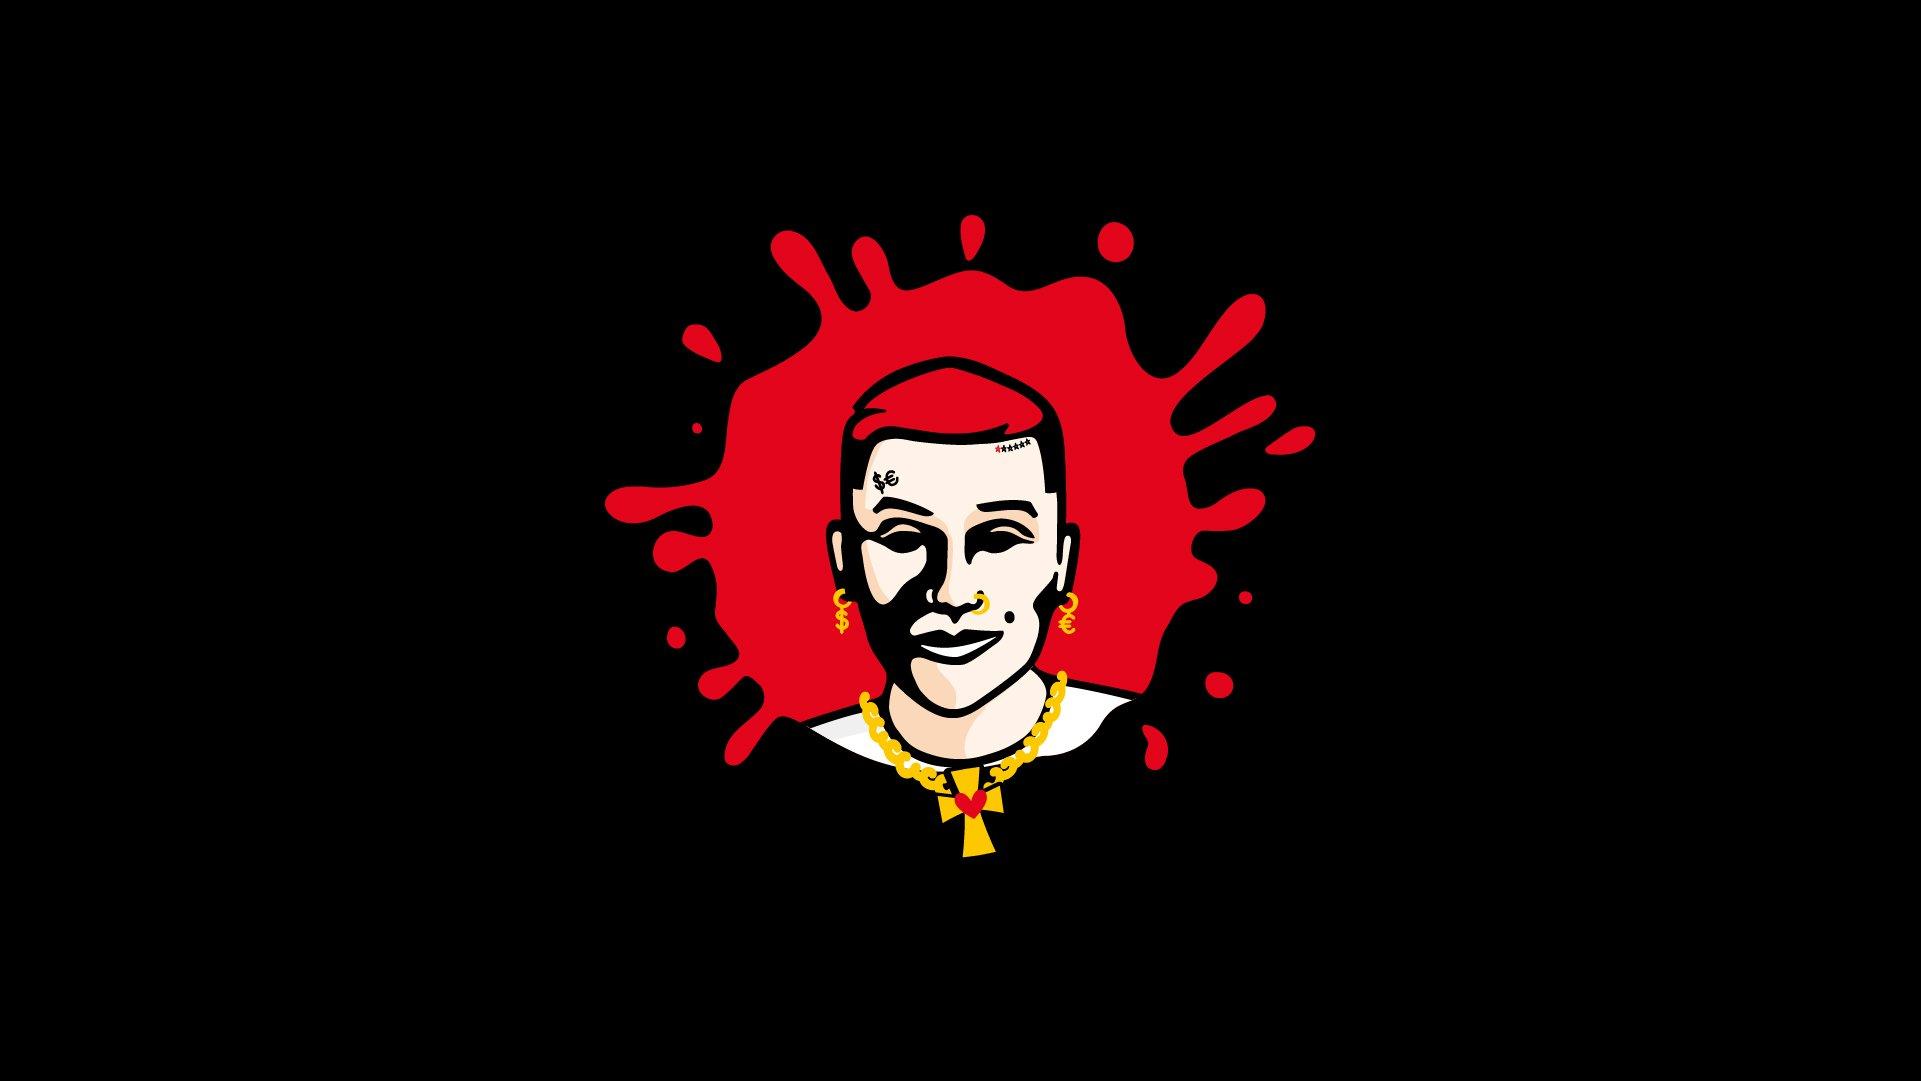 SFERA KFC MERCH 2020 graphics slider 04